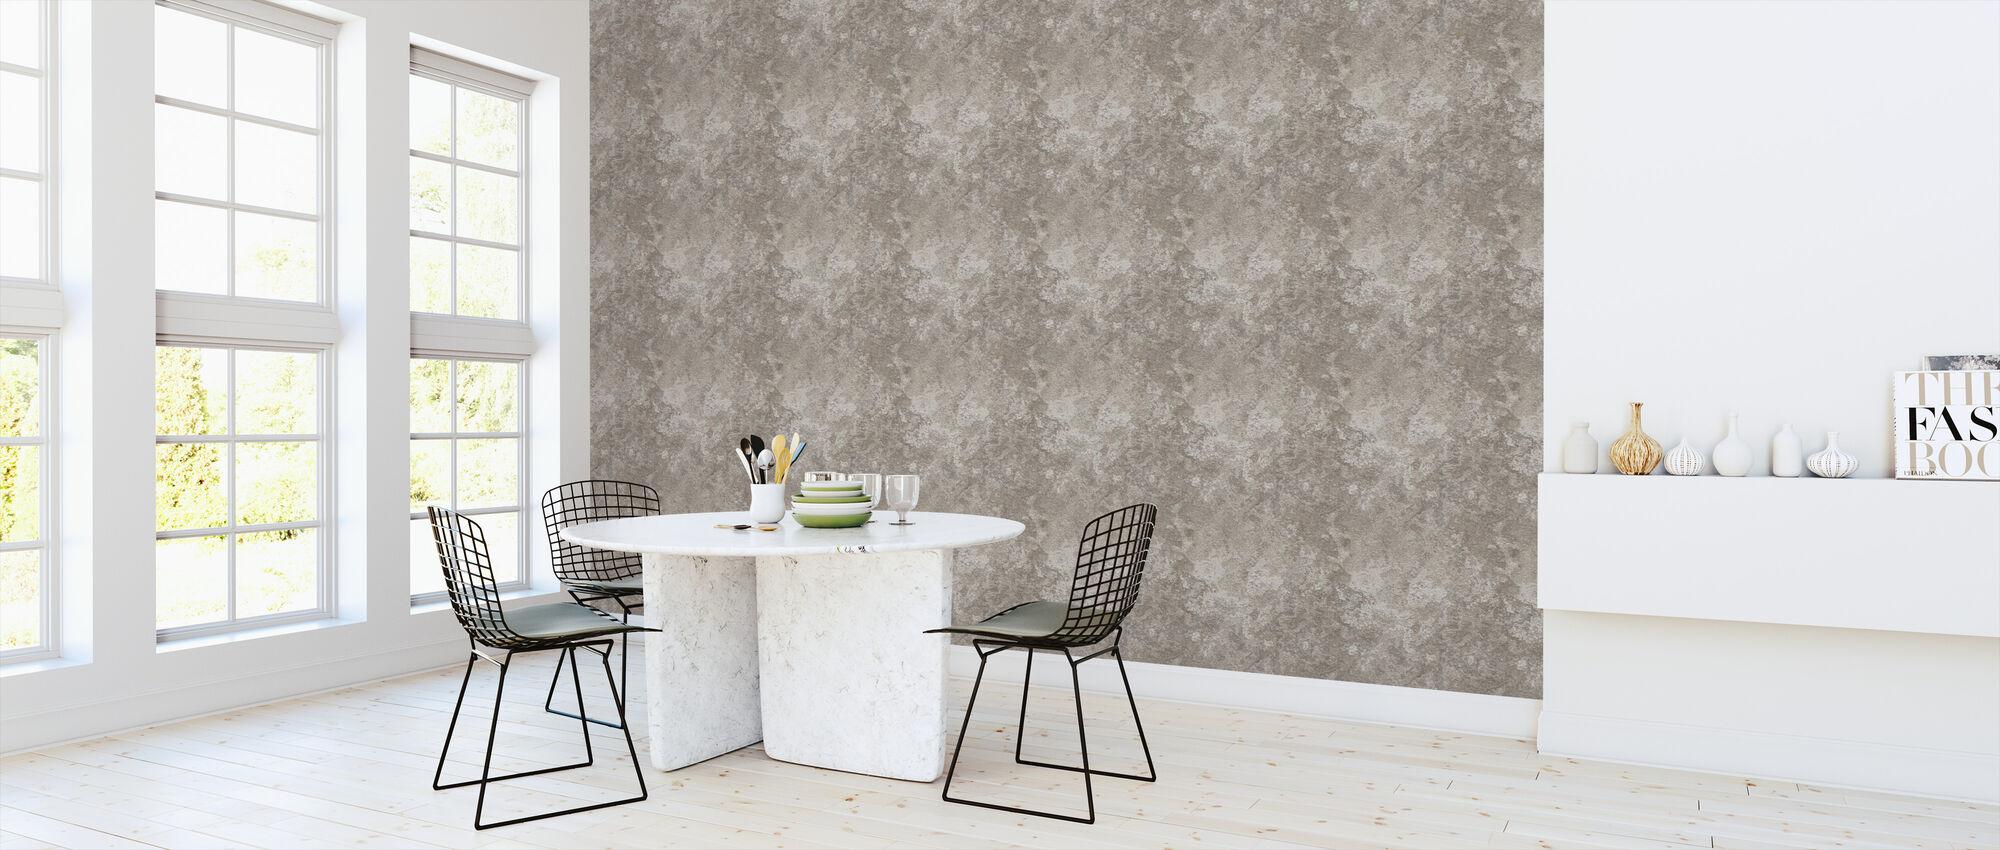 Old Plaster Concrete - Wallpaper - Kitchen